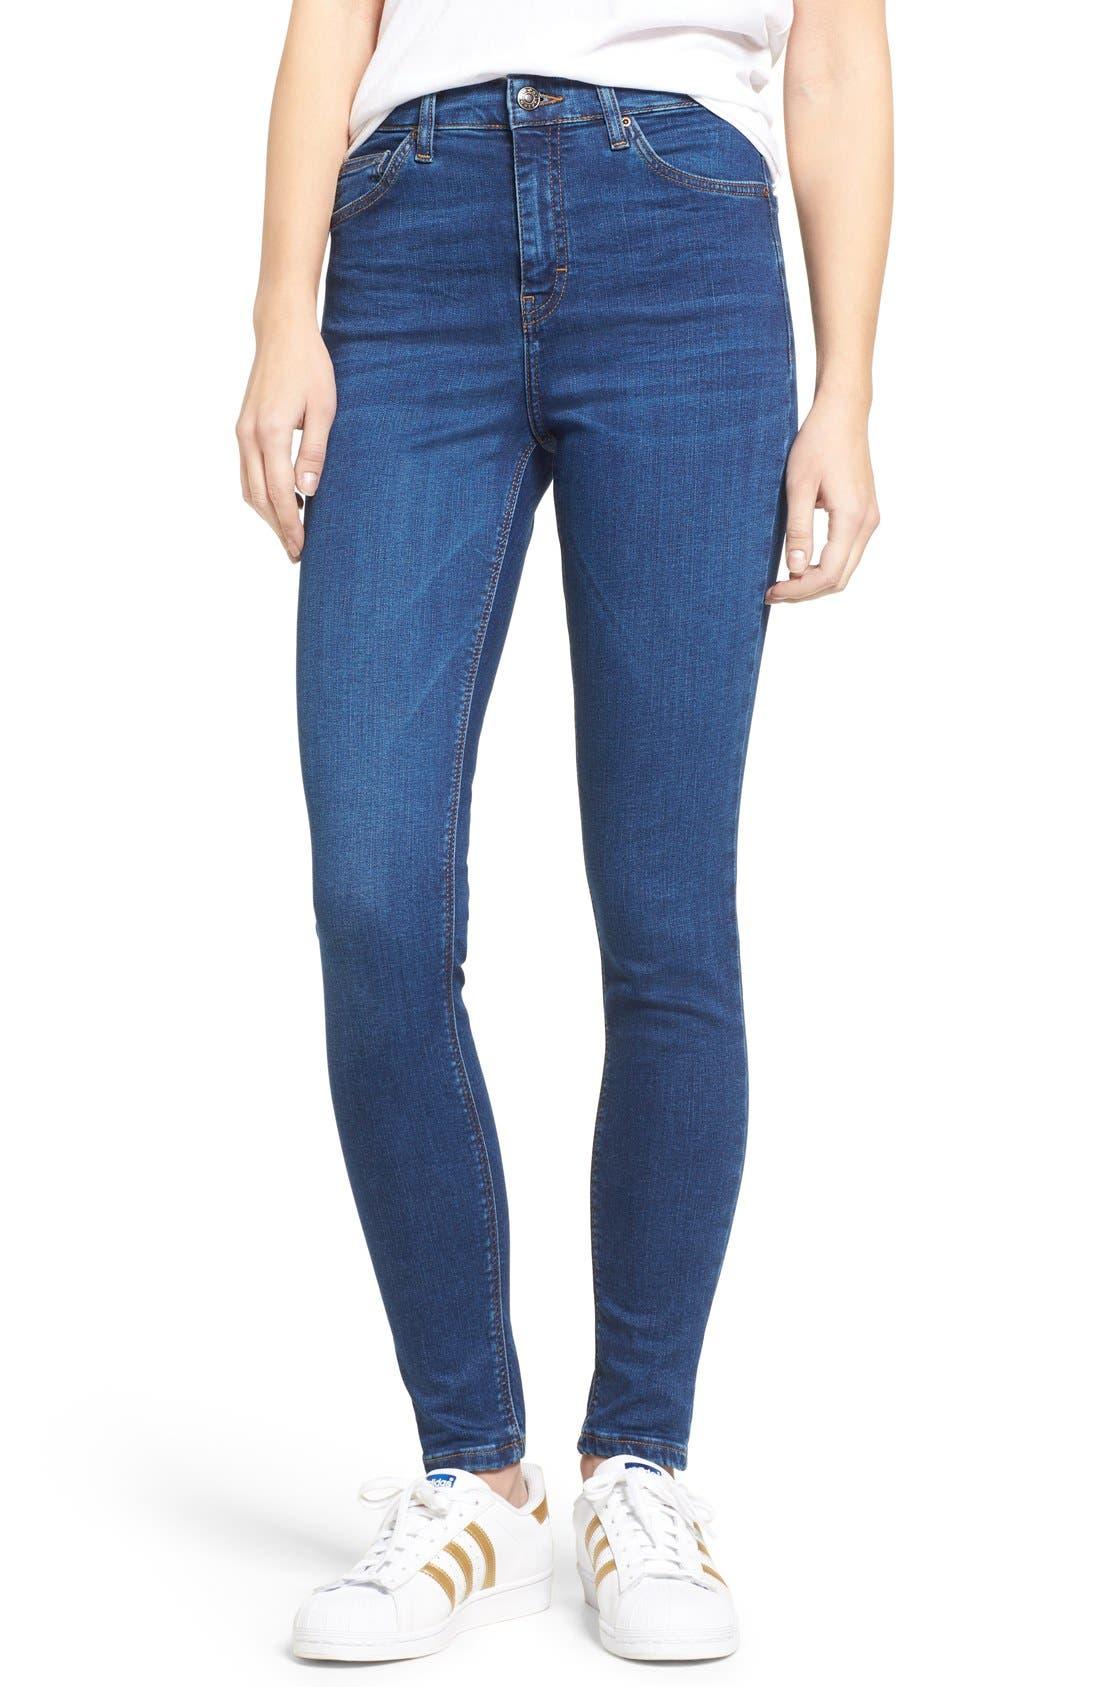 Jamie High Waist Ankle Skinny Jeans,                         Main,                         color, Navy Blue